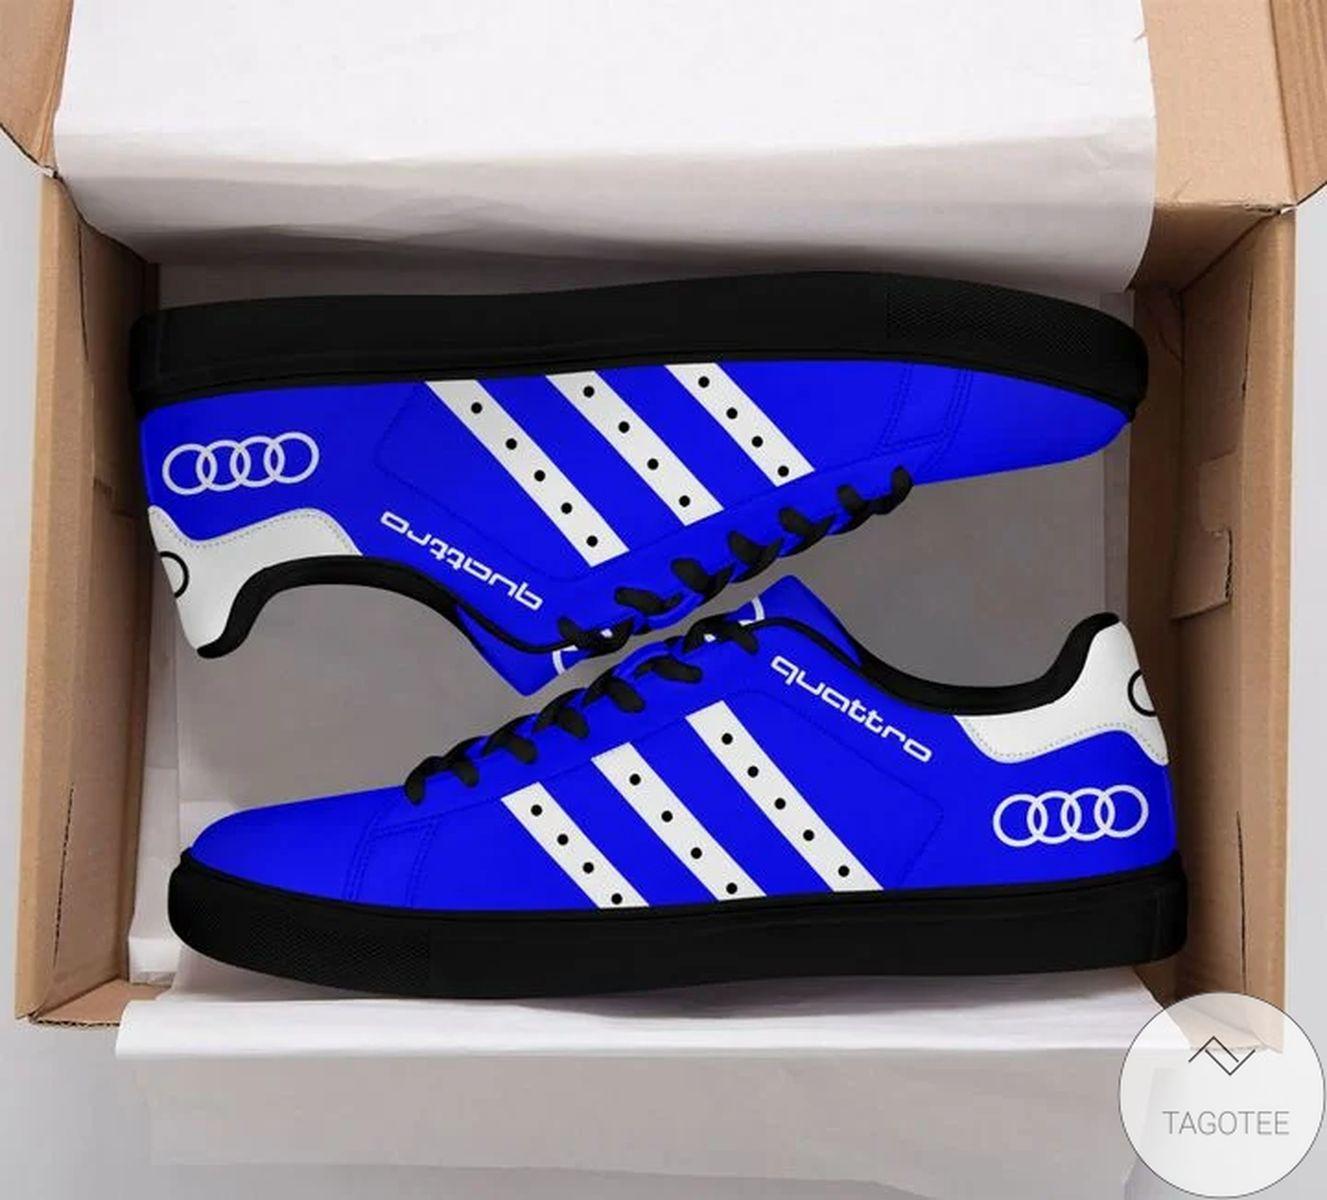 Audi Quattro Stan Smith Shoes